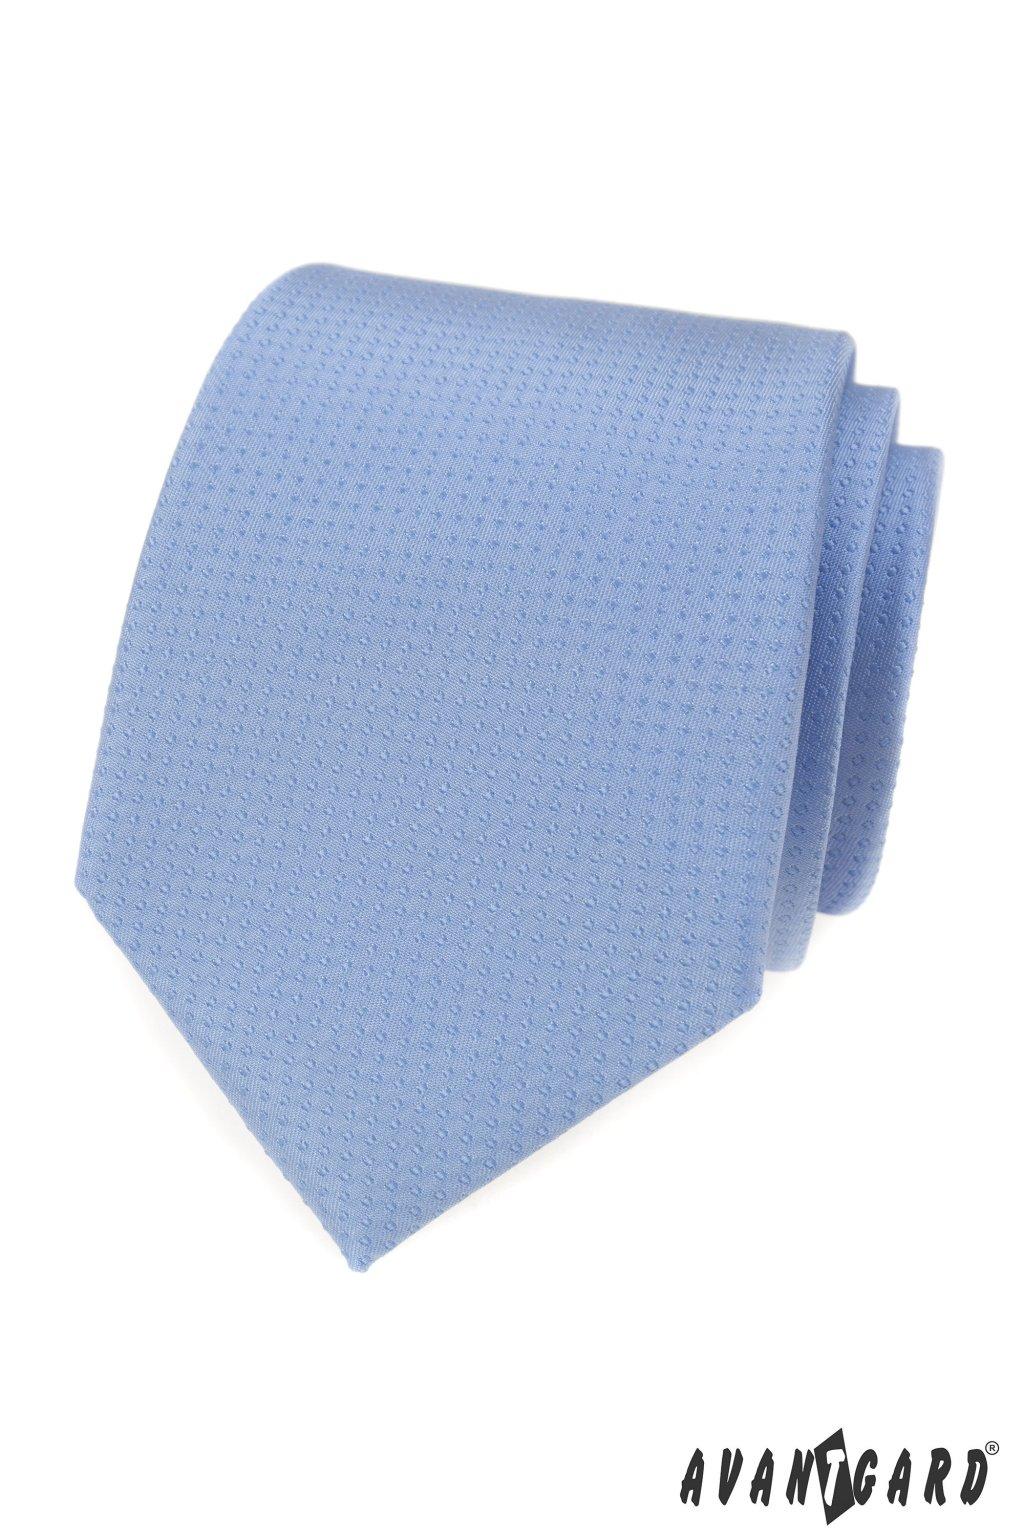 Kravata LUX modrá 561 - 14991